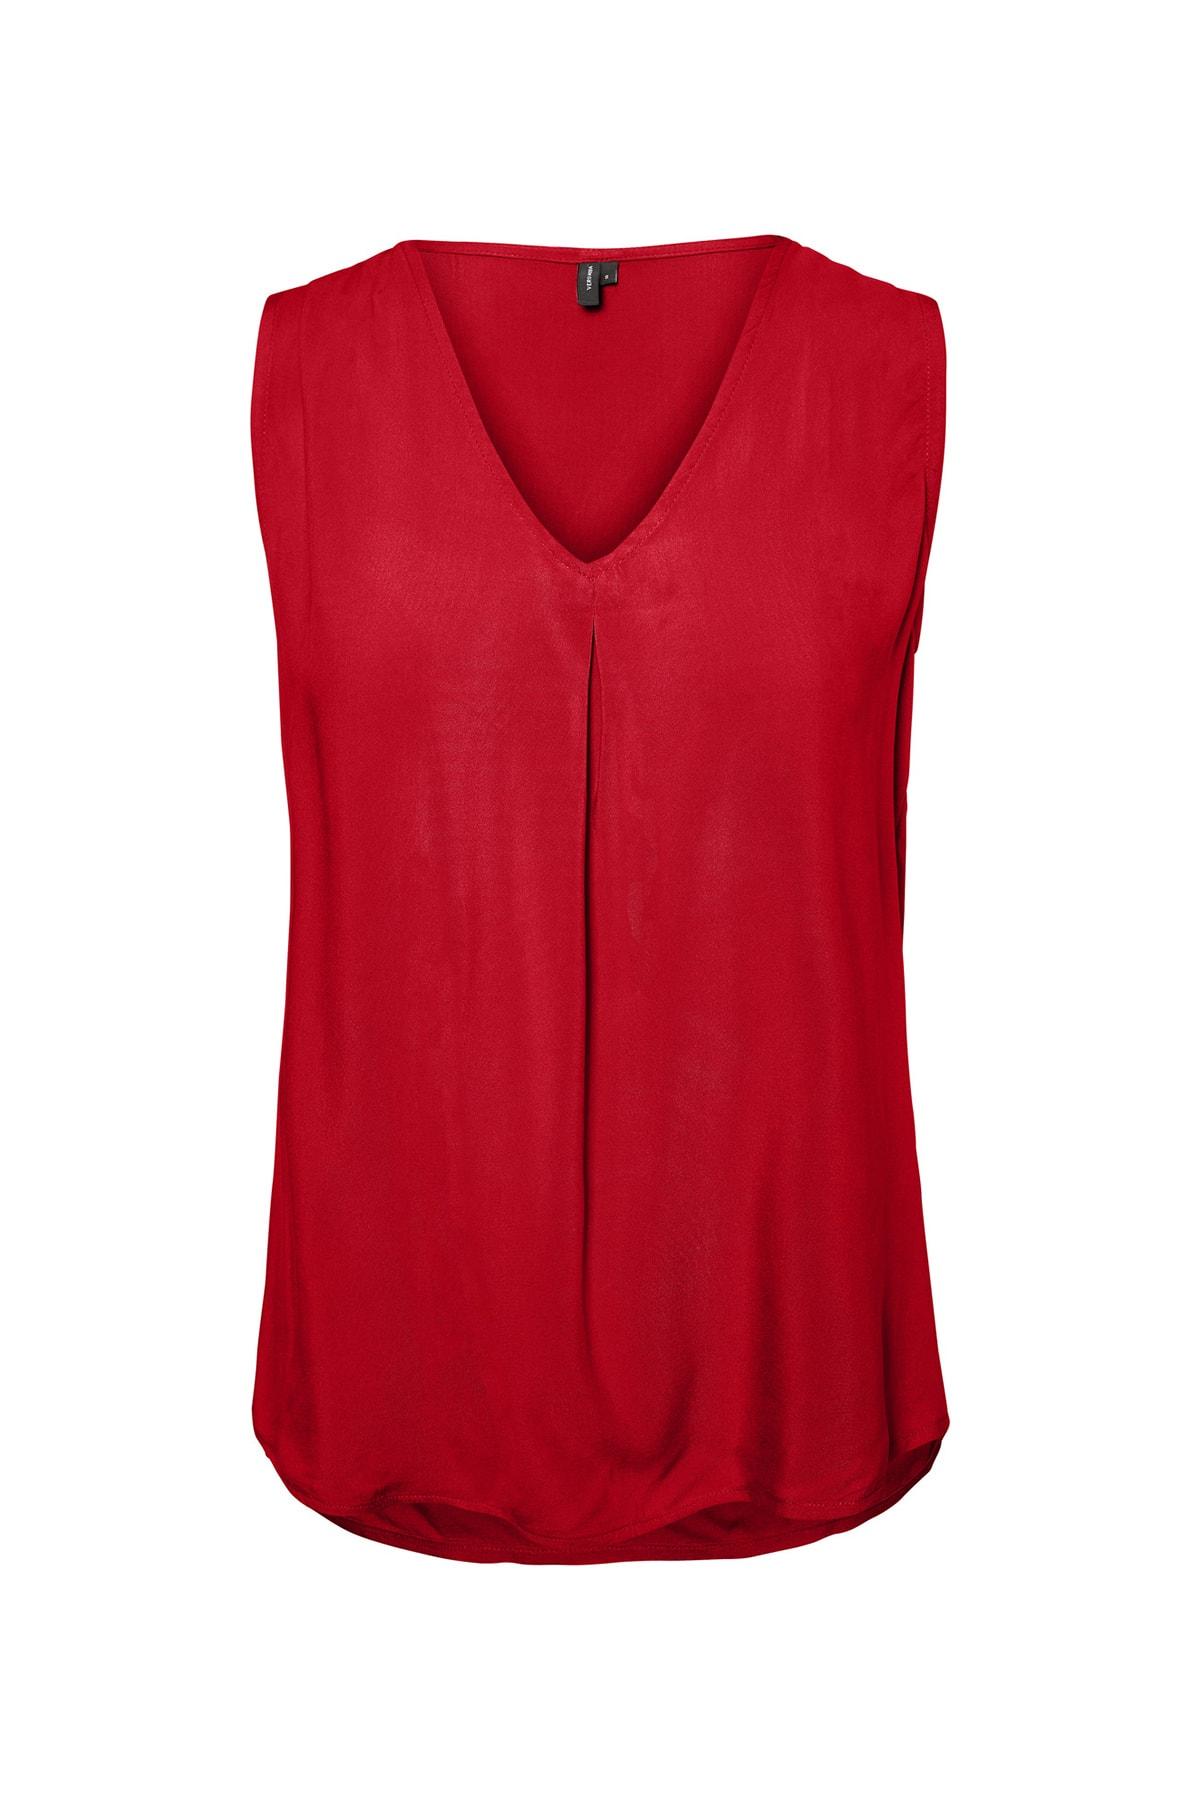 Vero Moda Kadın Kırmızı V Yaka Kolsuz Viskon Bluz 10212968 VMEVA